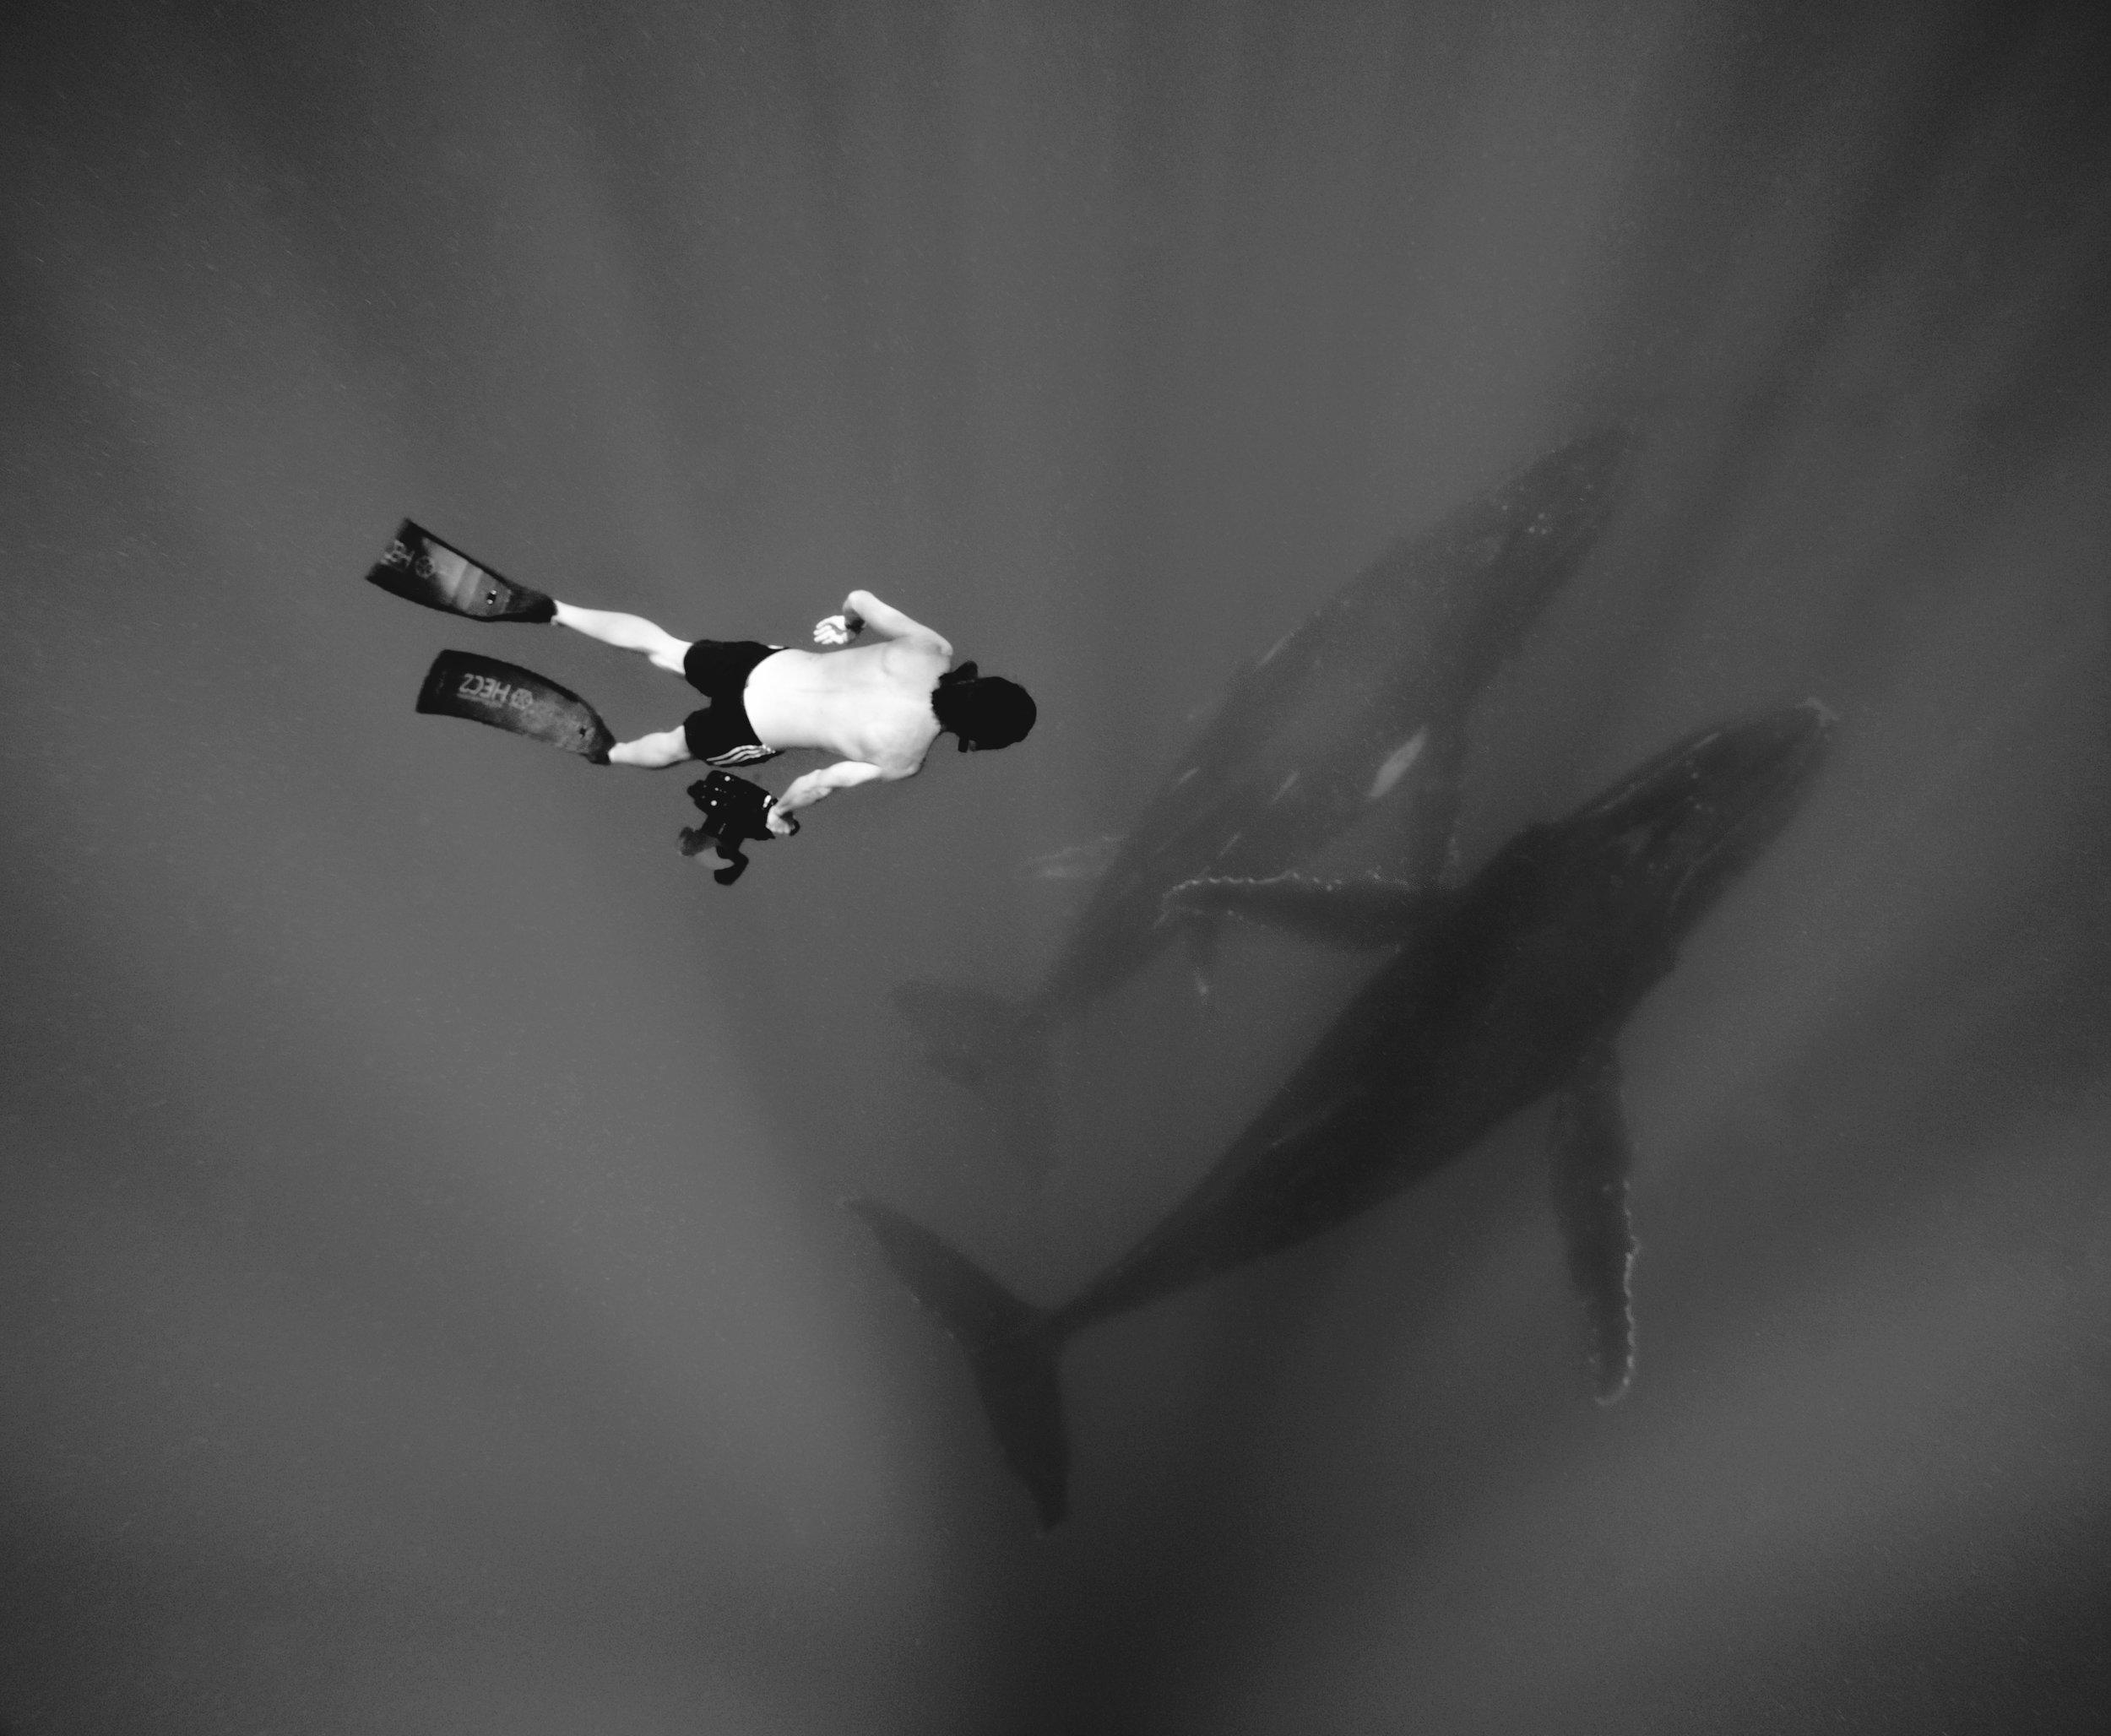 whales-and-mattlowres.jpg